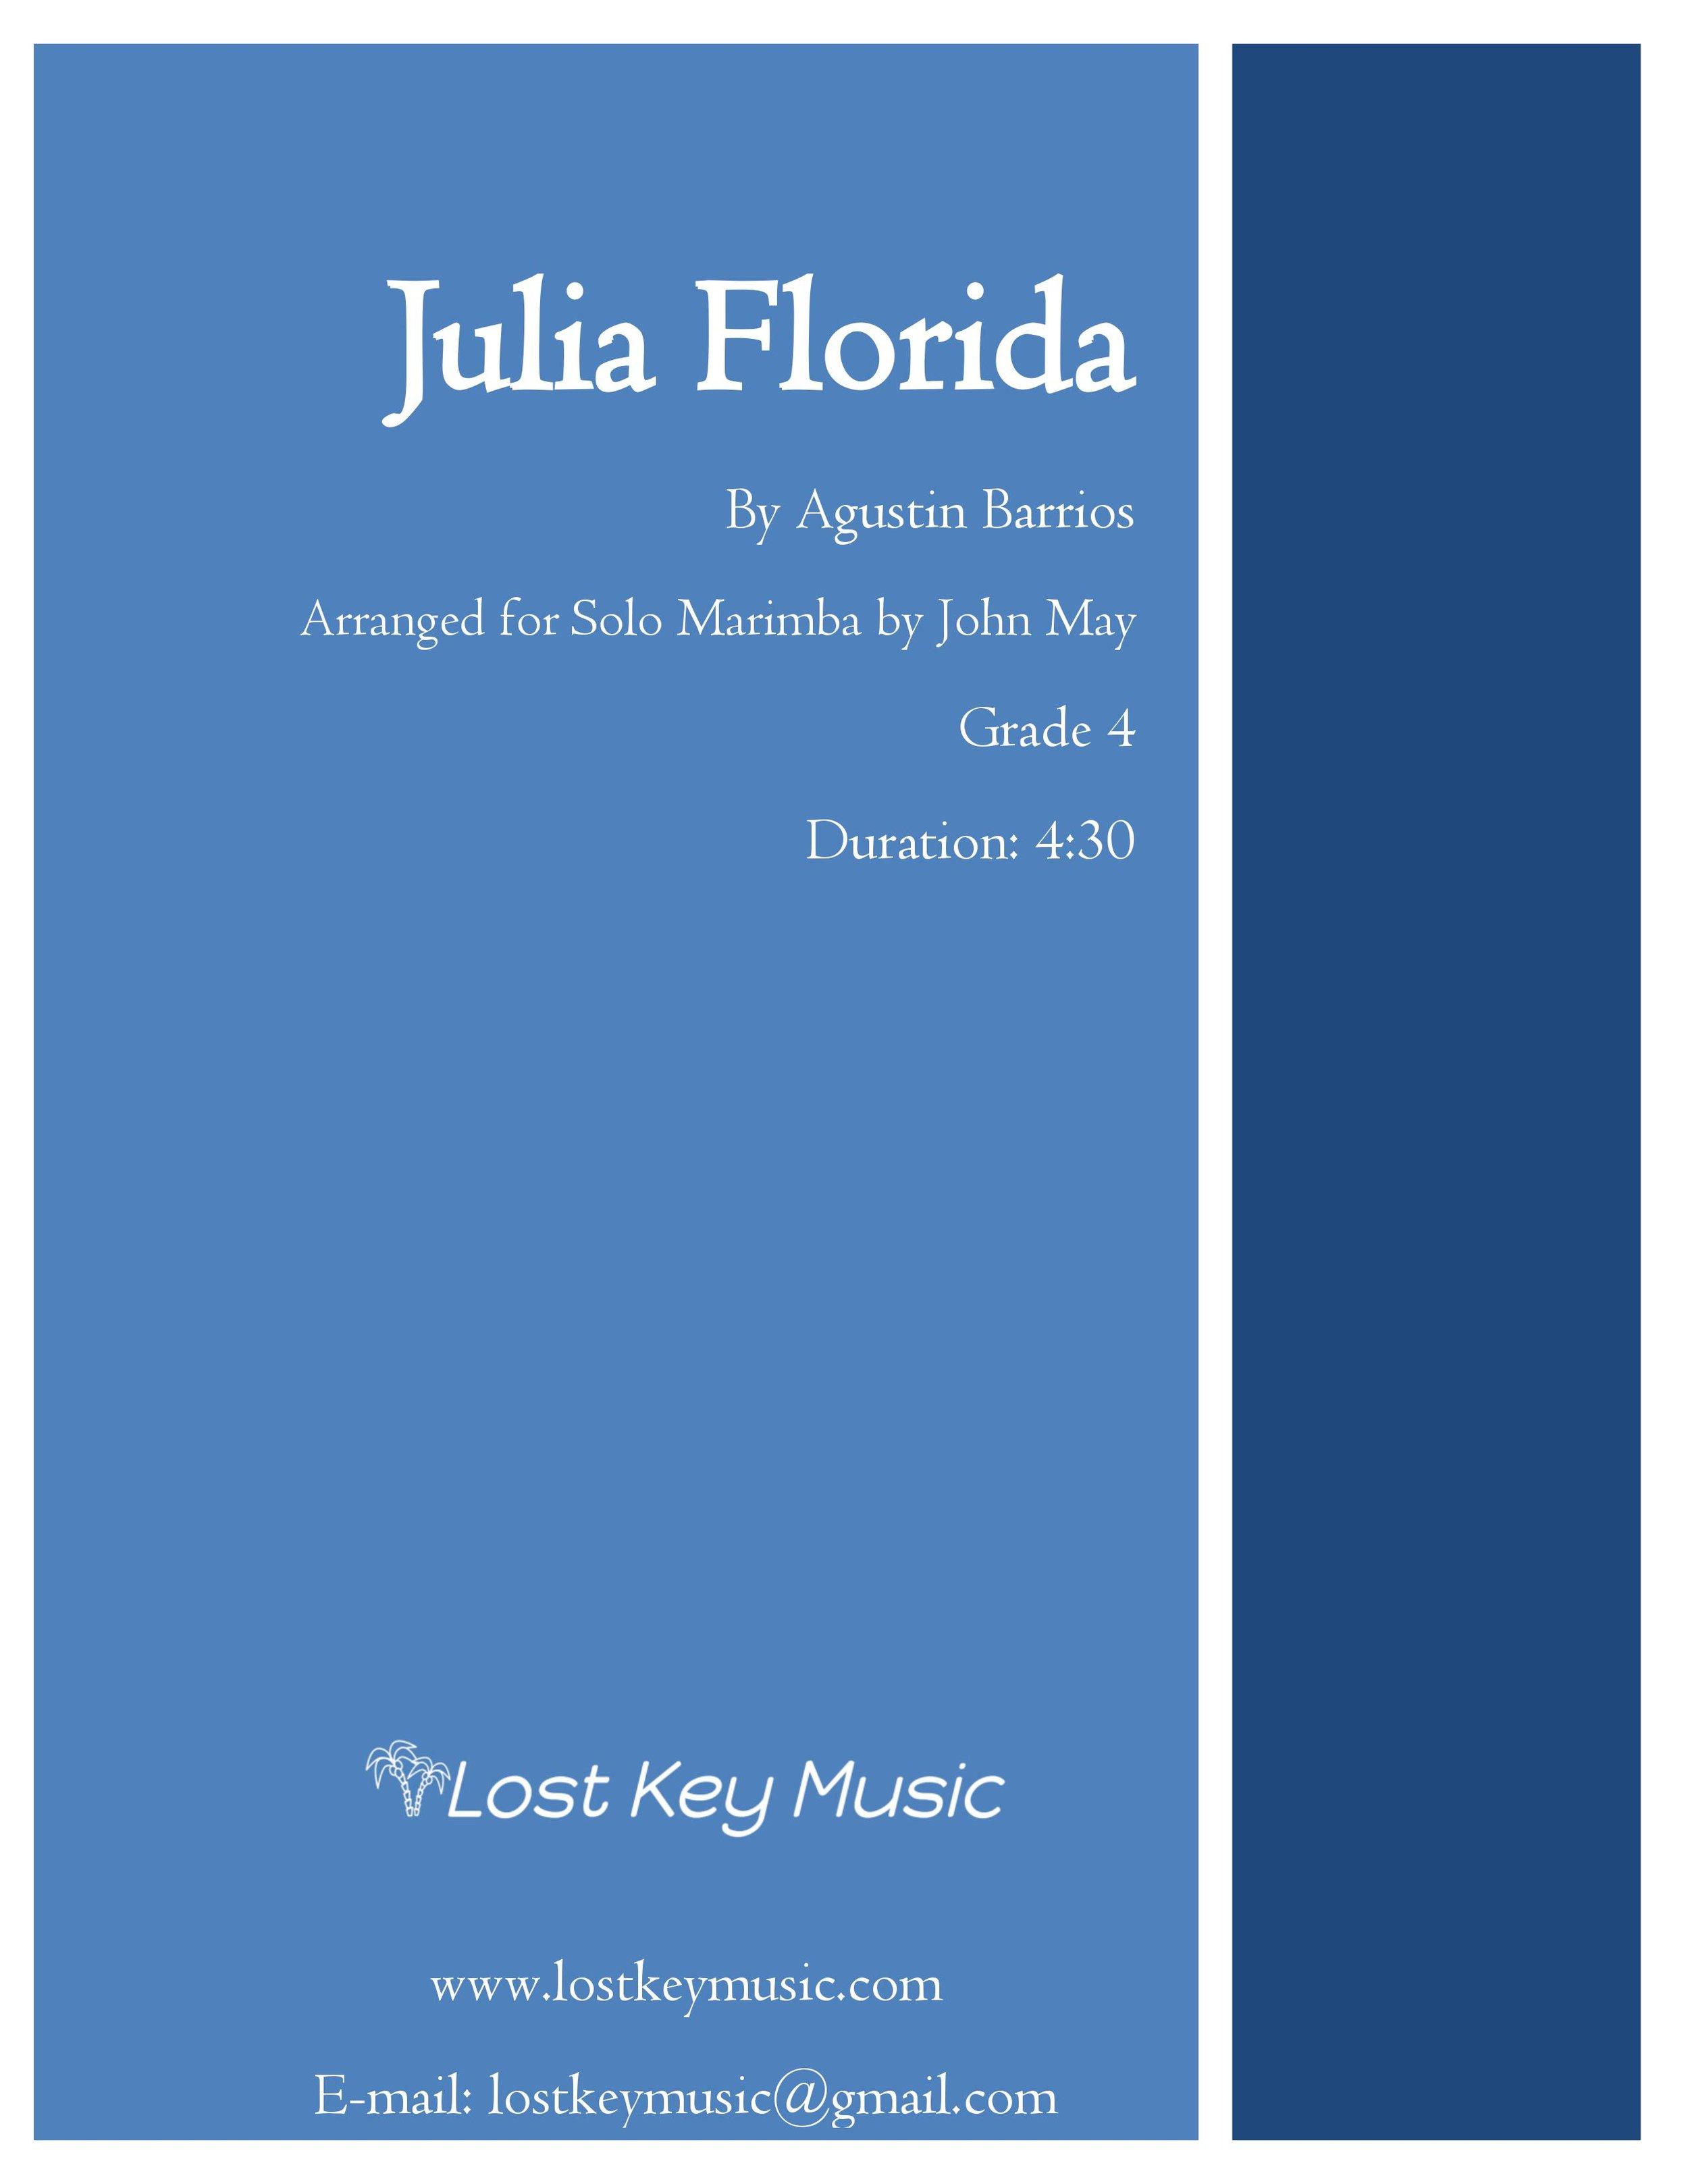 Julia Florida cover photo.jpg